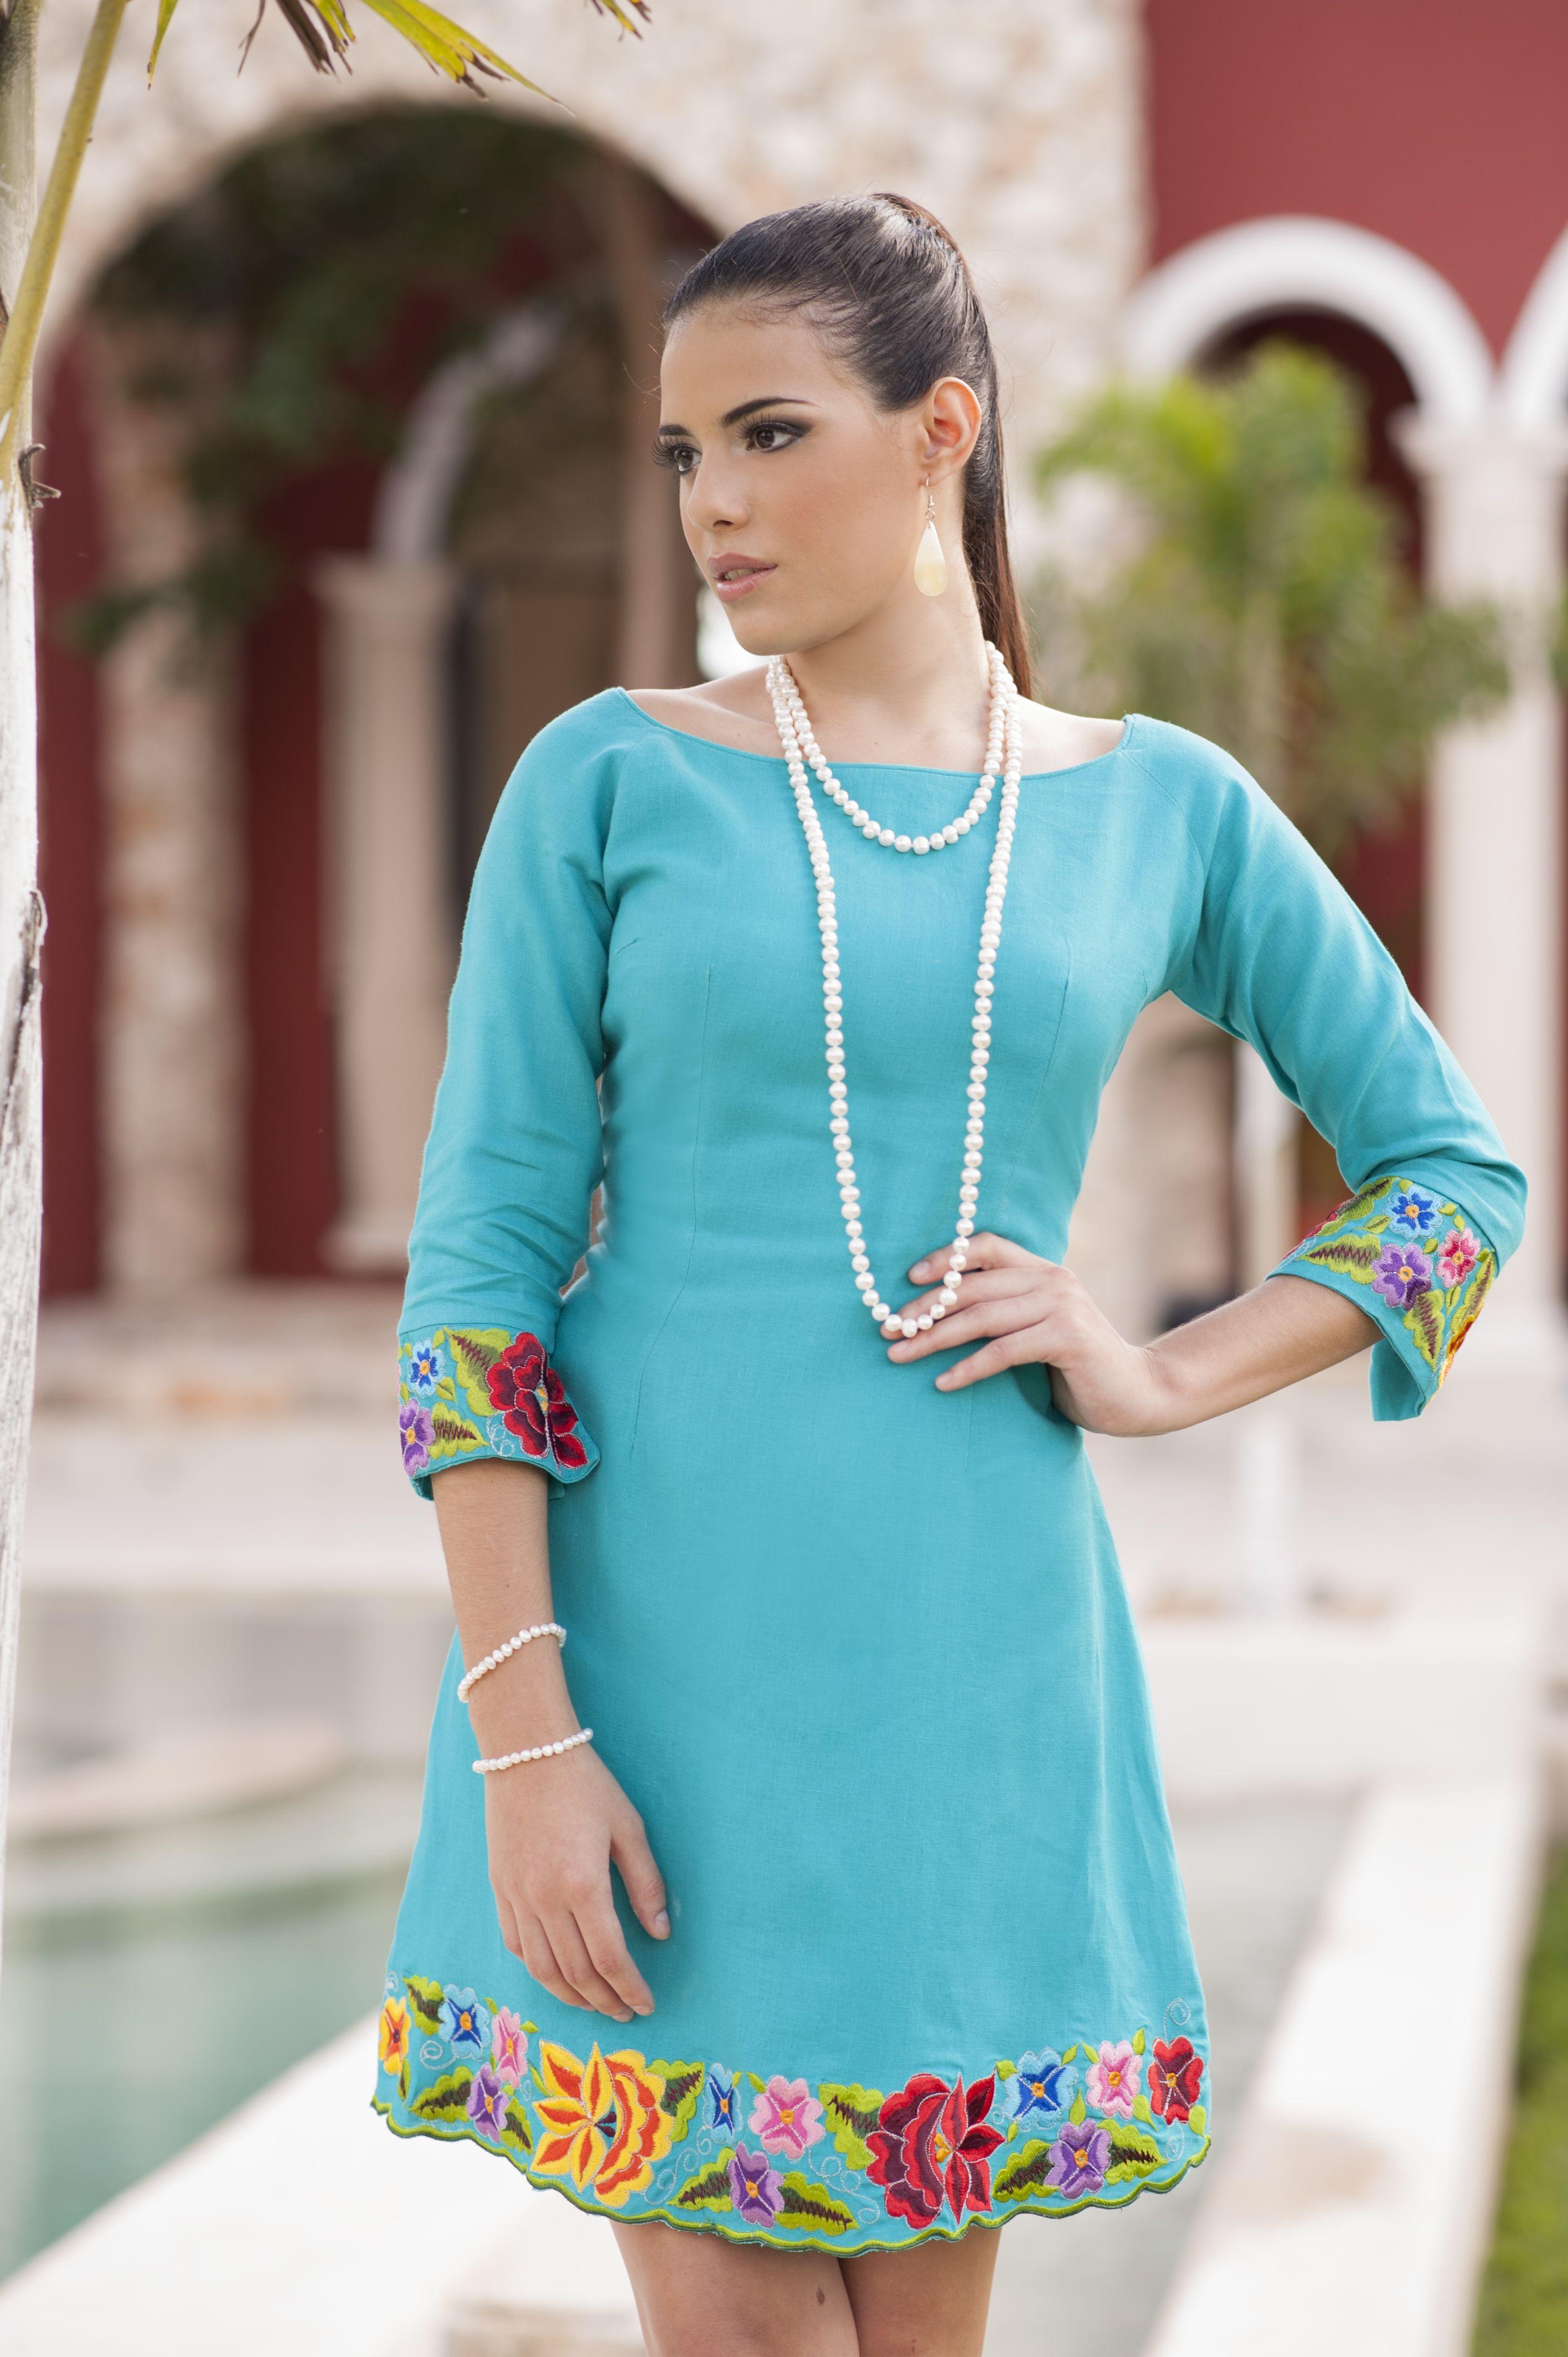 c15c2de721 Vestido corto de lino